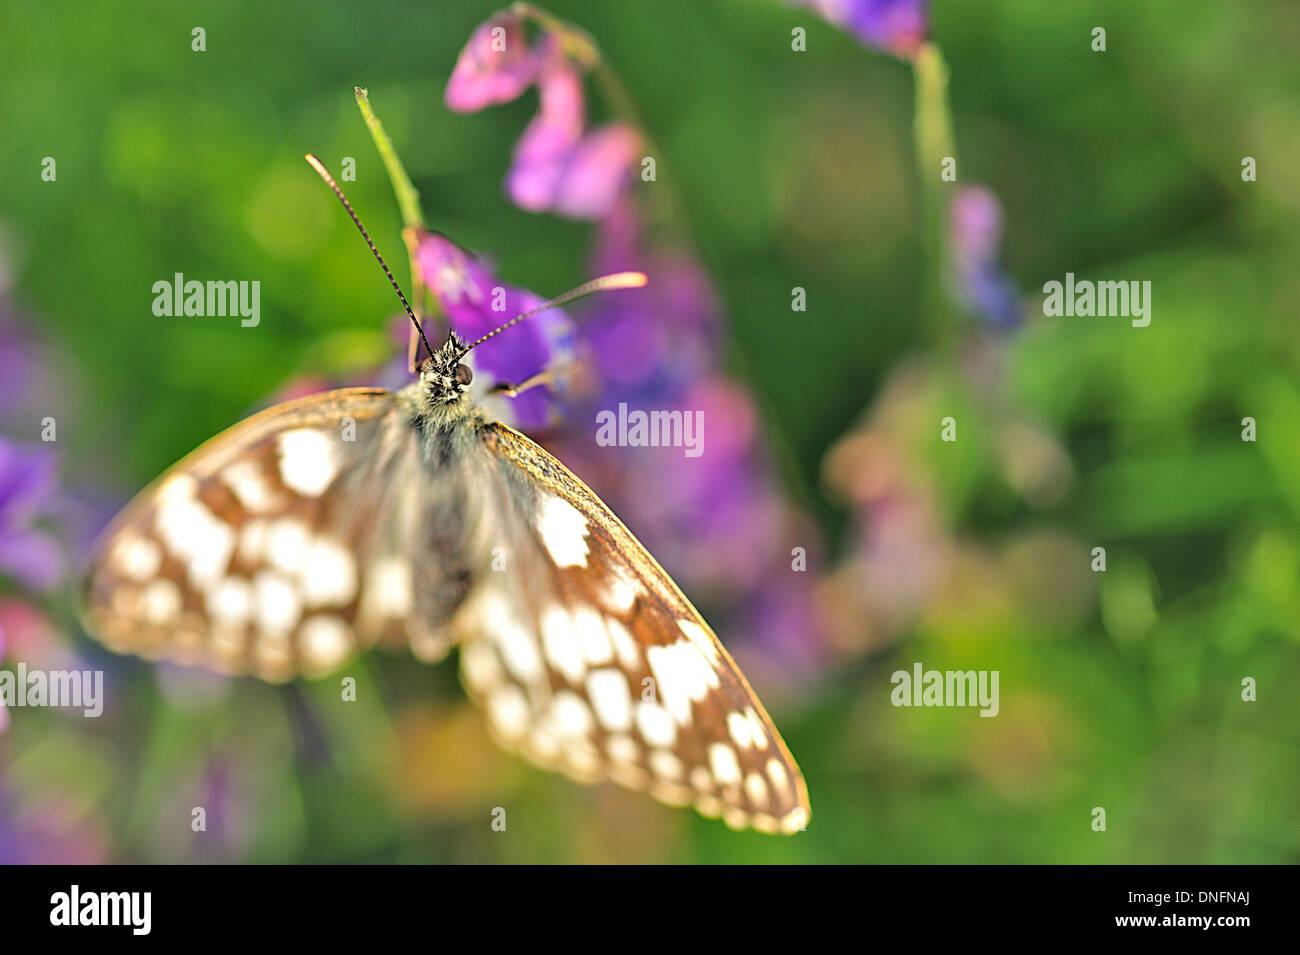 Marbled White Butterflies Melanargia galathea, Satyridae, Castelluccio di Norcia, Umbria, Italy R - Stock Image